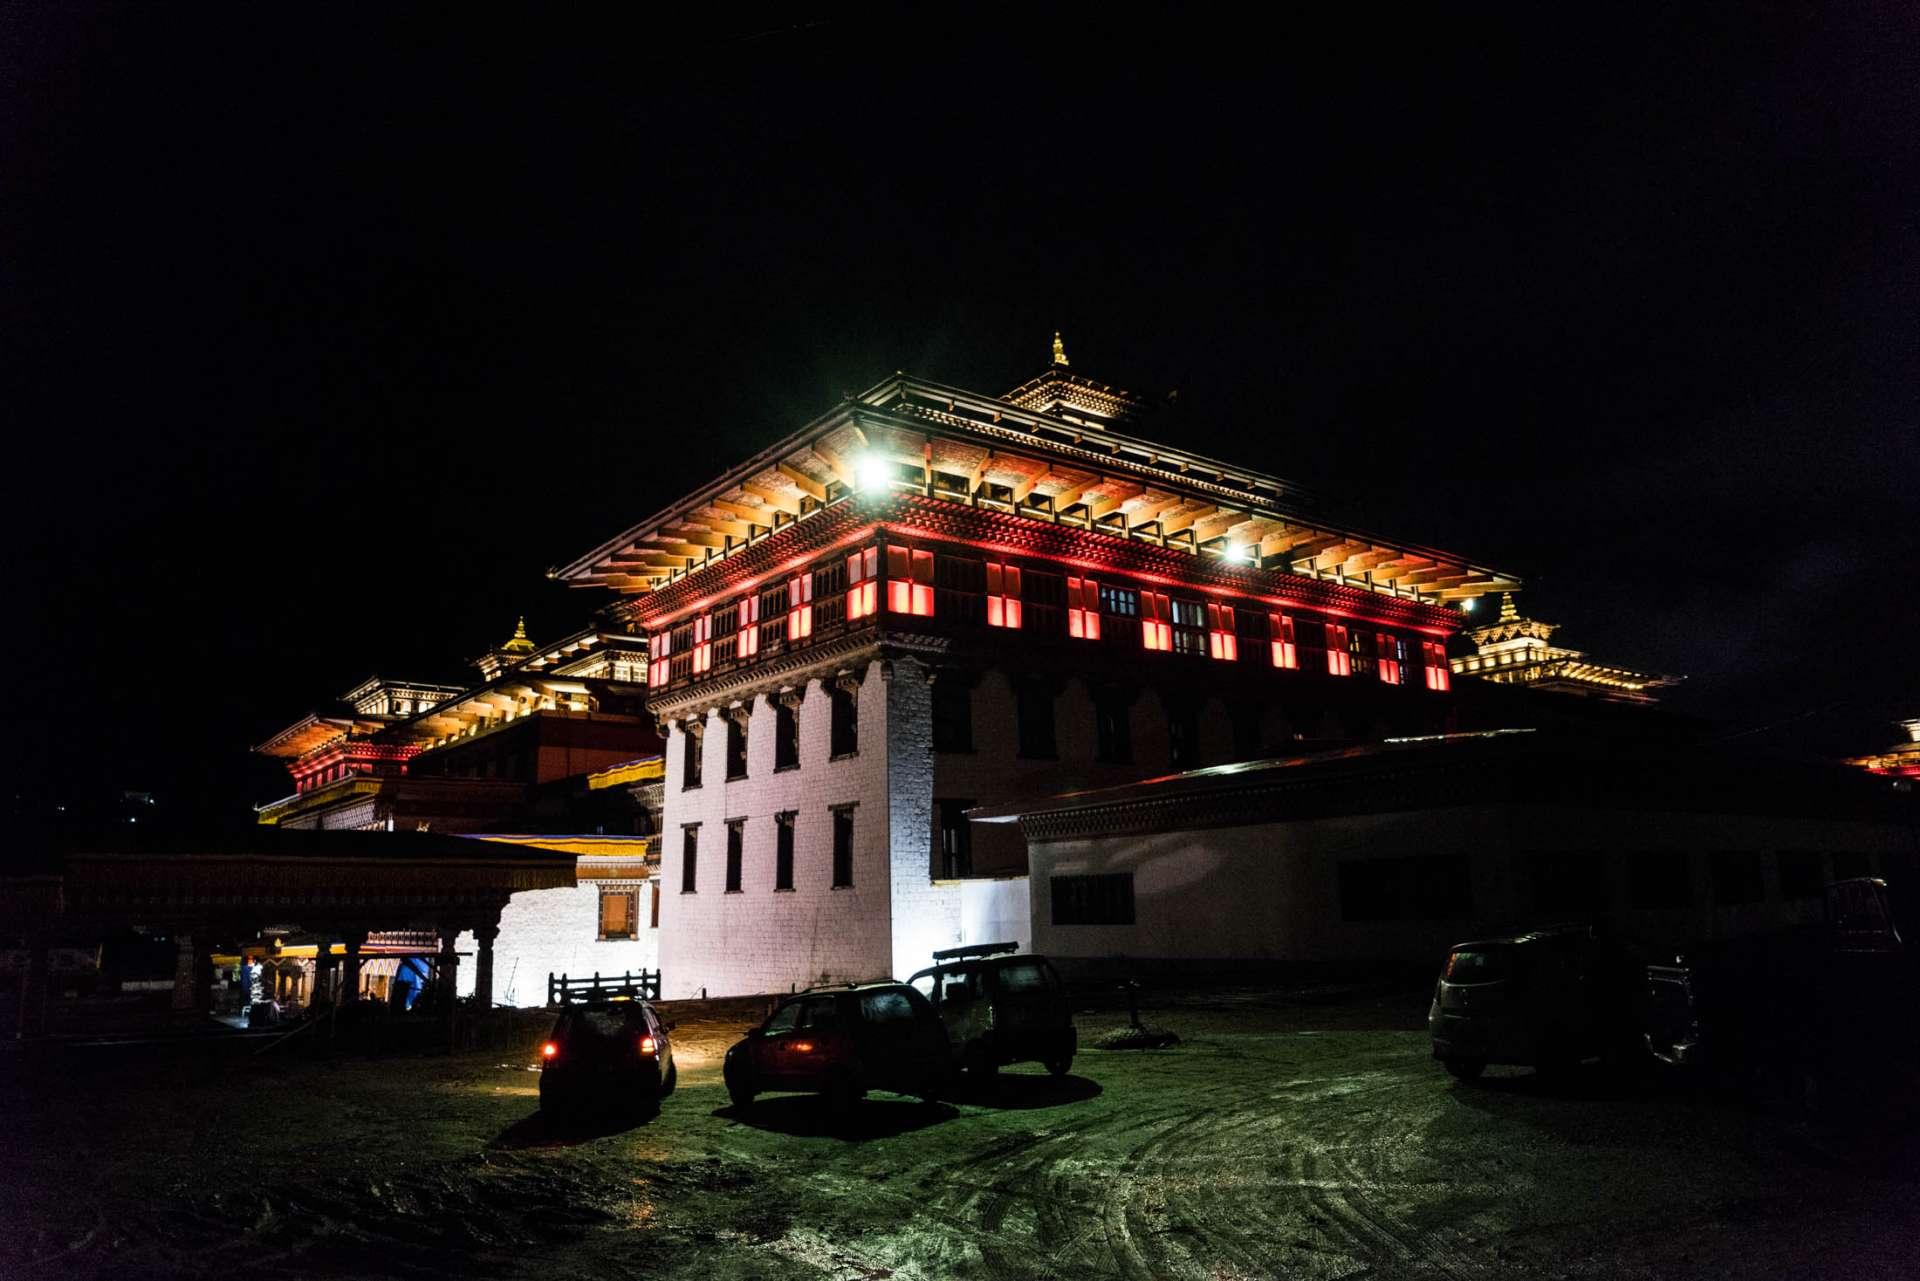 Tashichho Dzong Thimpu Bhutan Pescart enrico pescantini